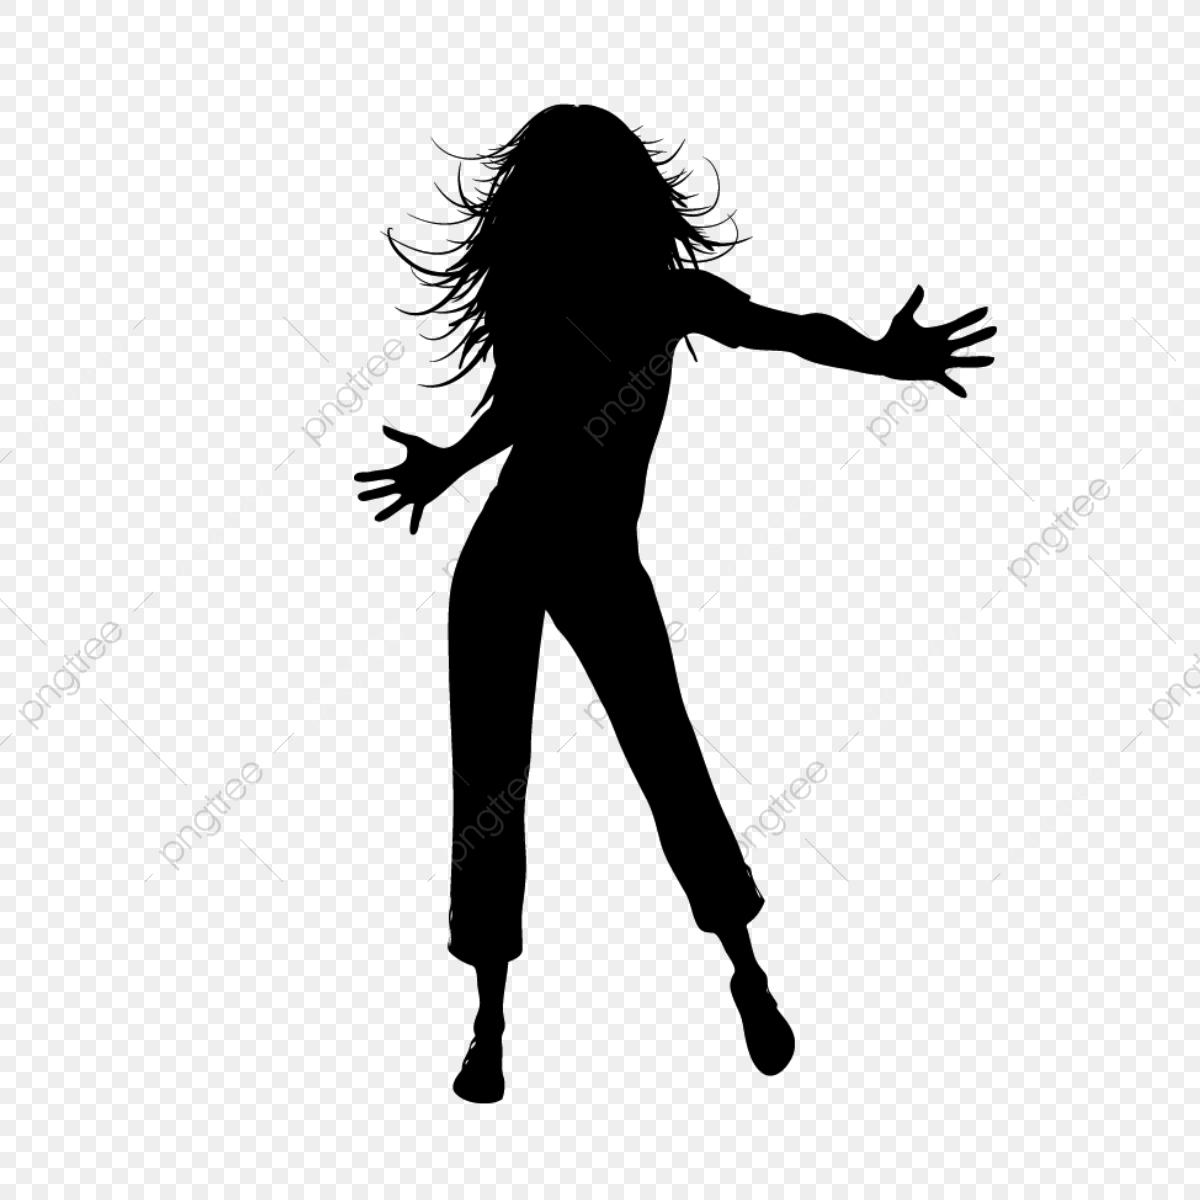 Dancing Girl Silhouette, Family, Family Tree, Girl Dancing PNG.